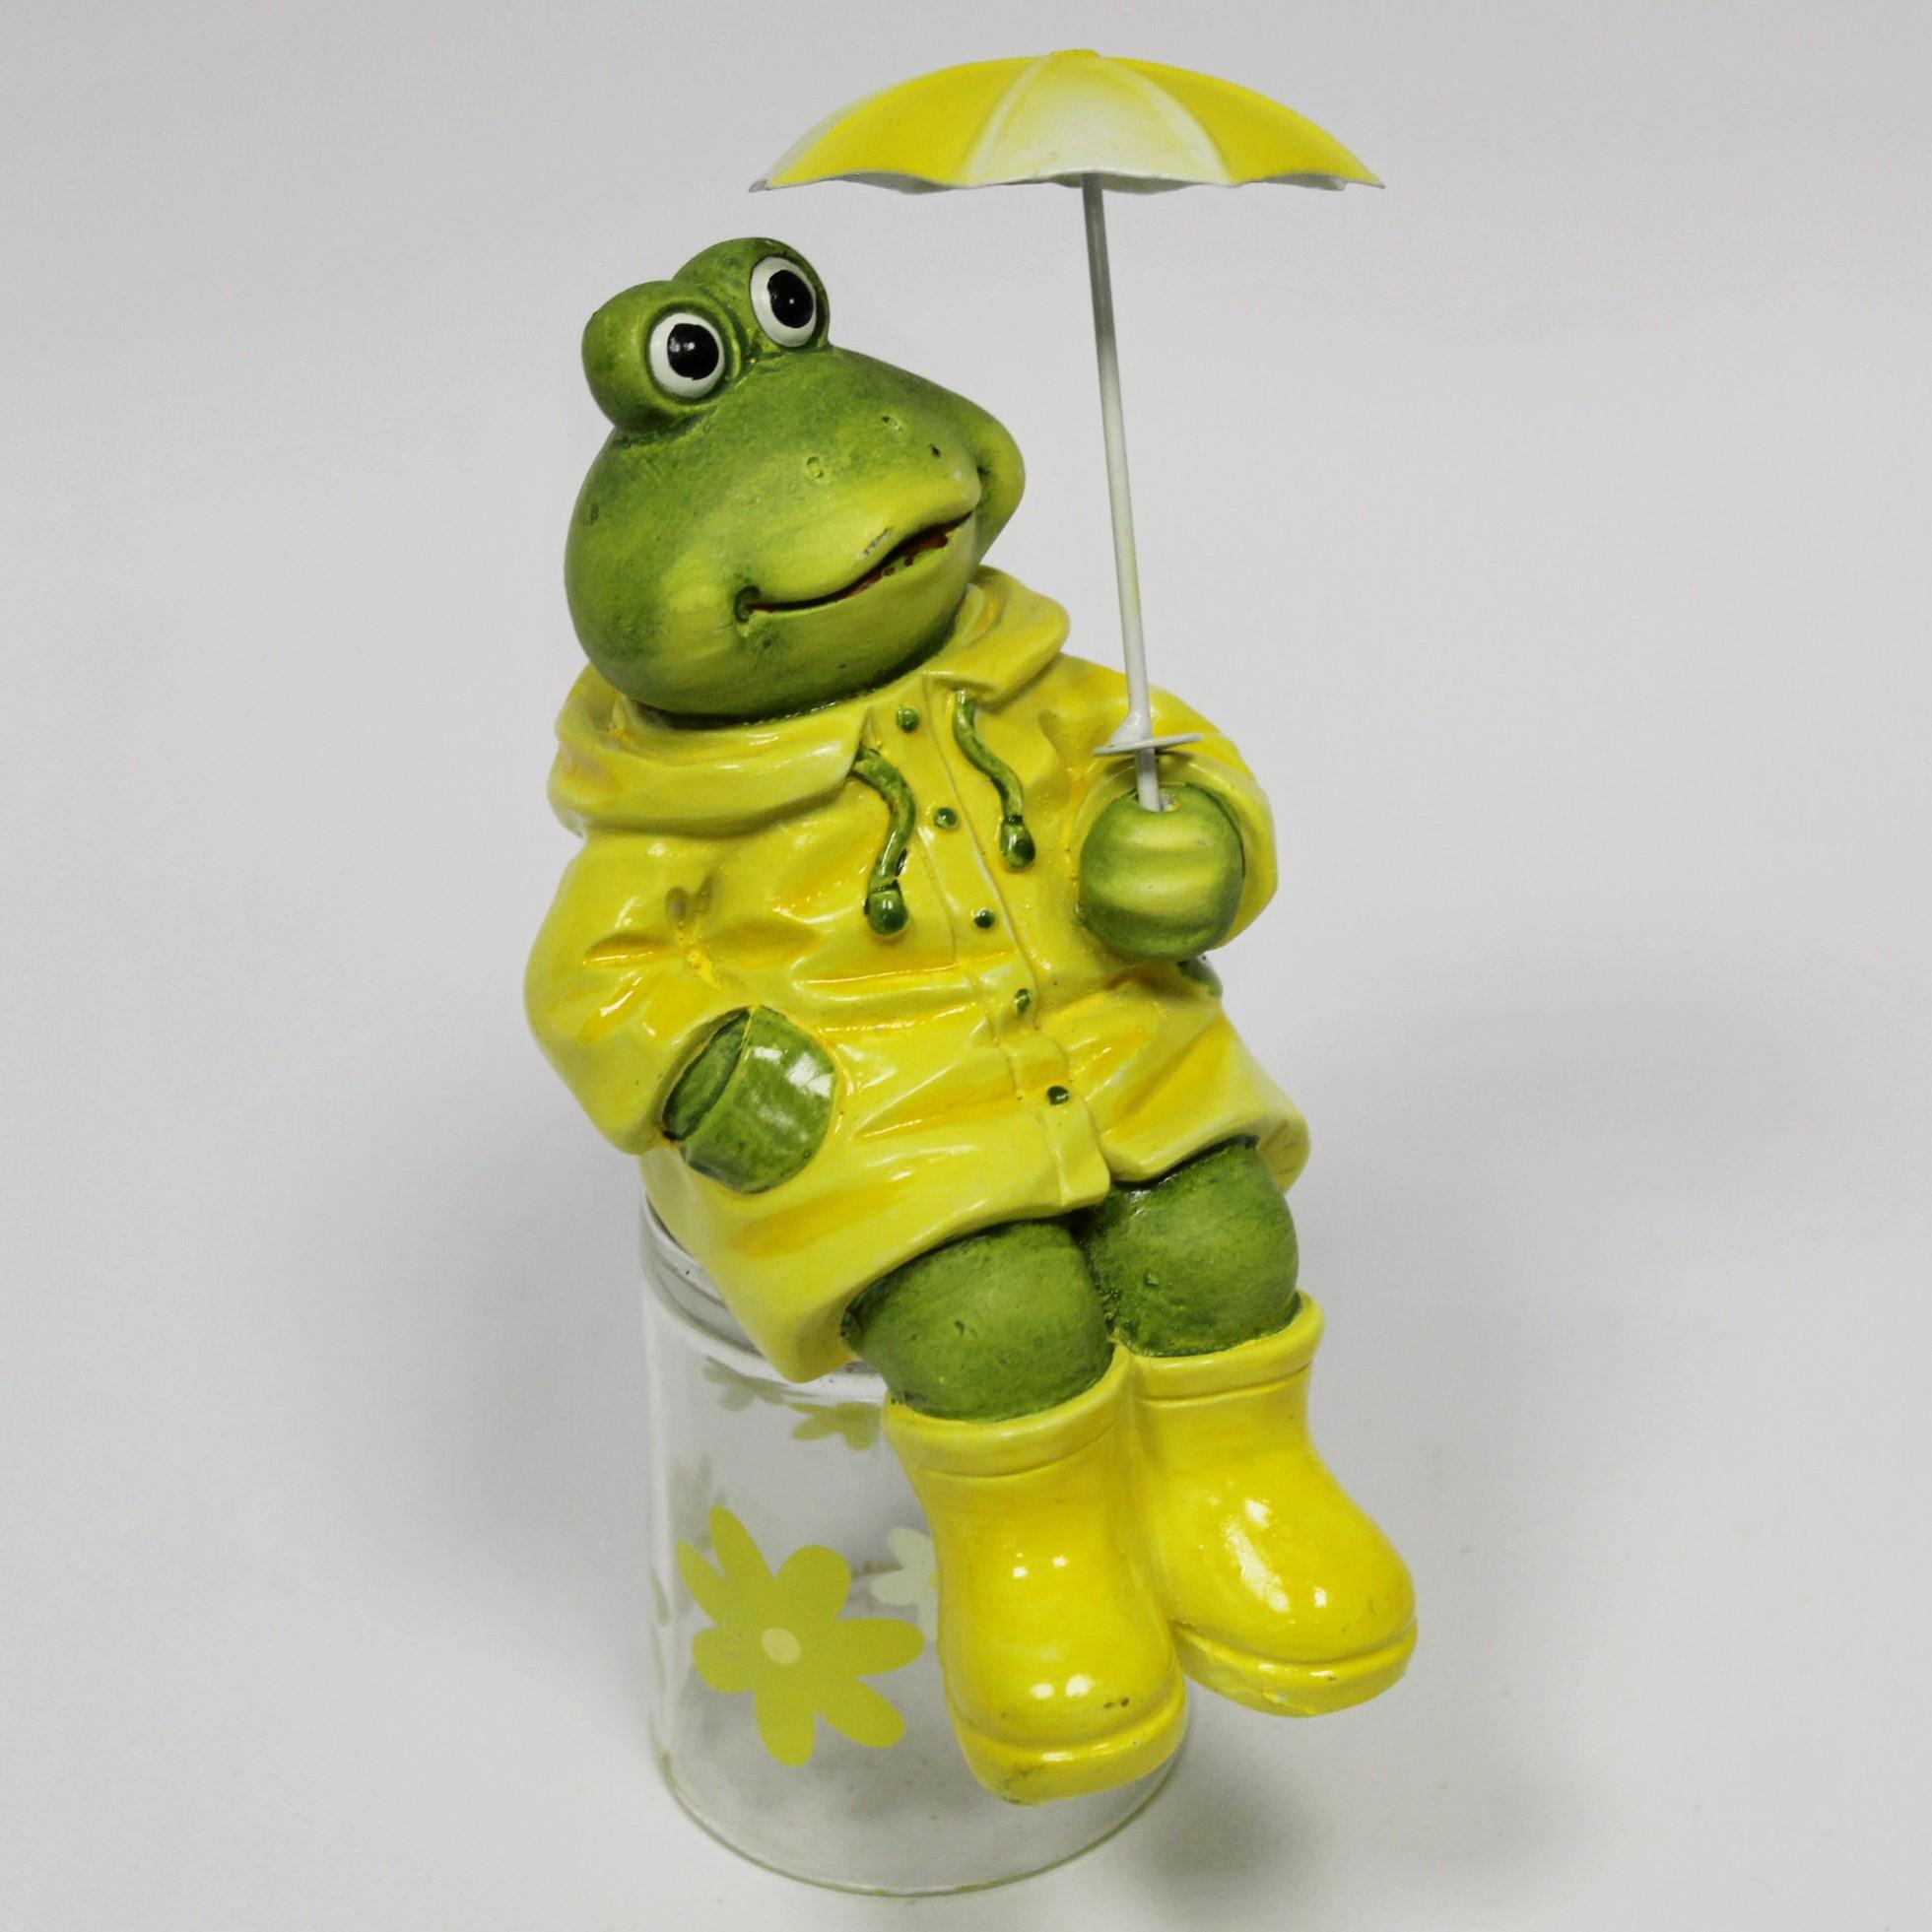 Žába s deštníkem keramika/kov 13cm